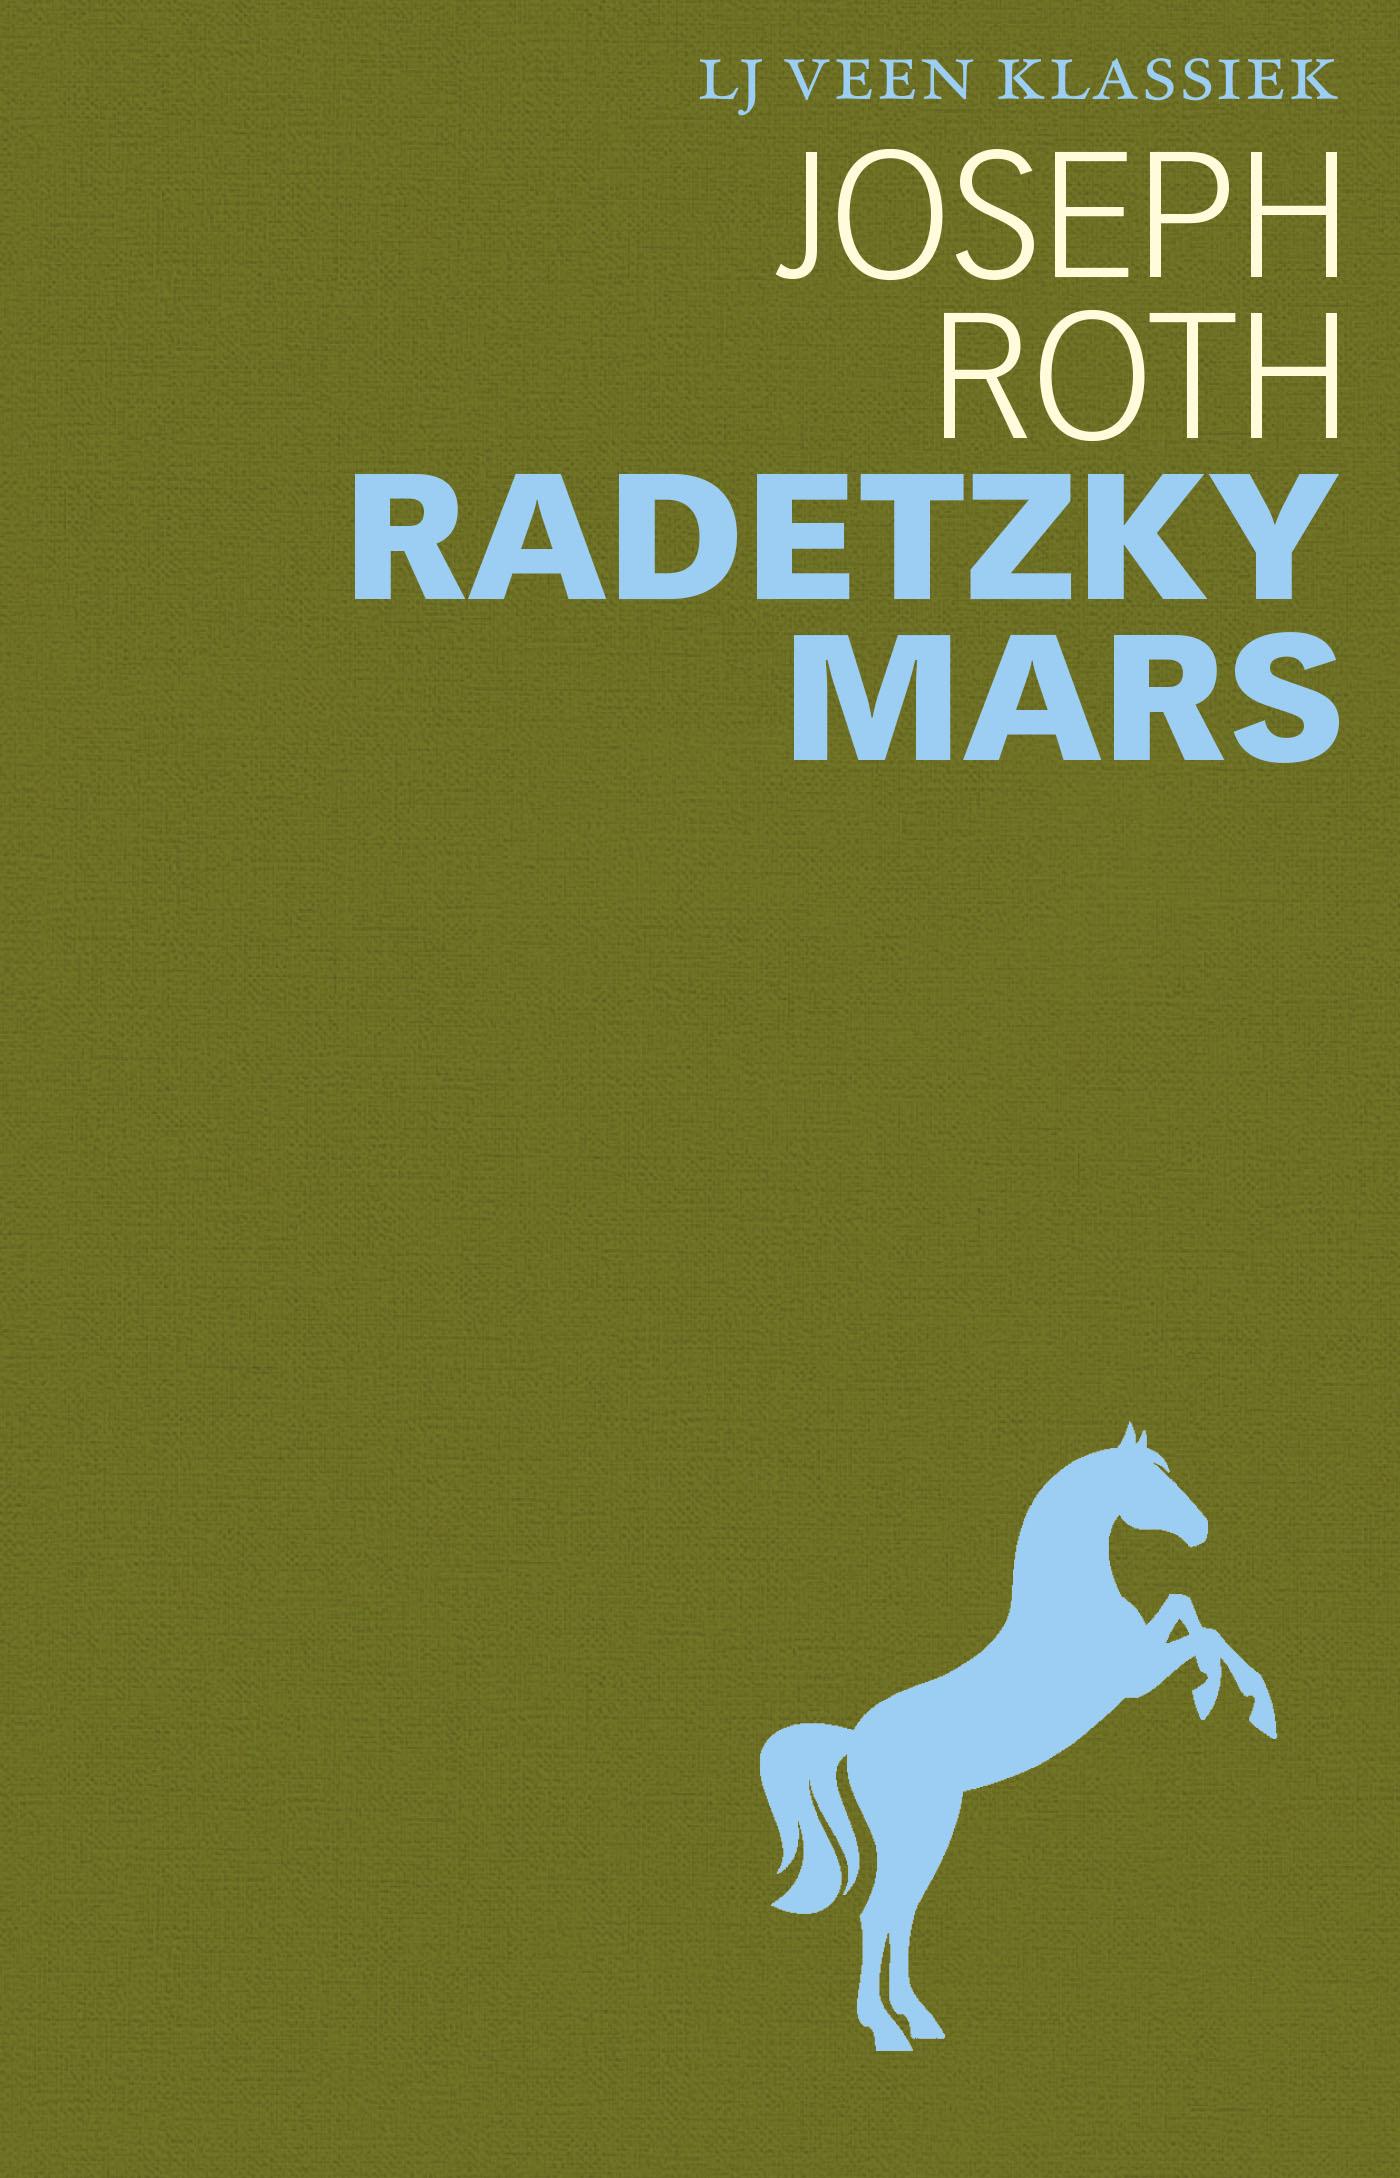 Radetzkymars (vertaling Elly Schippers)